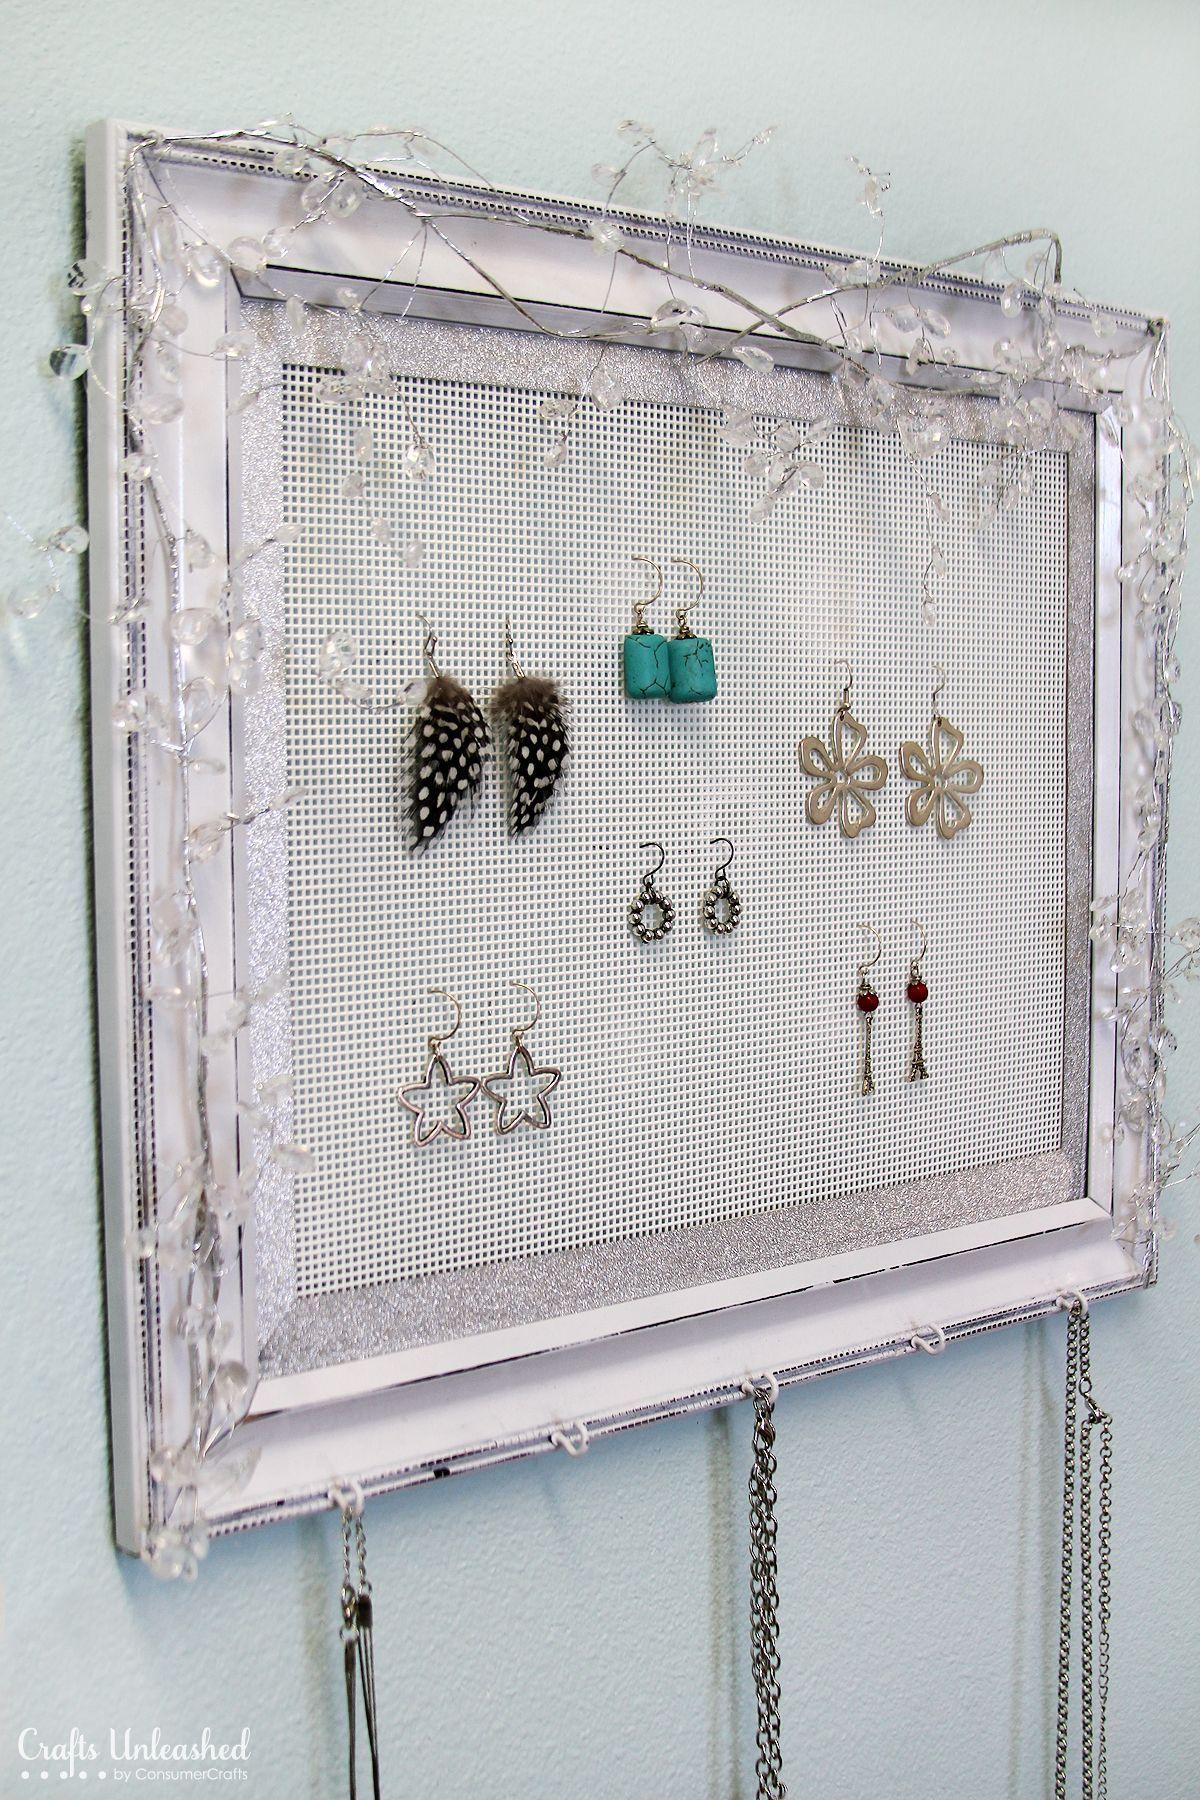 Diy Jewelry Holder Ideas, Display, Storage, Organizer, Pendants, Wire, Beads